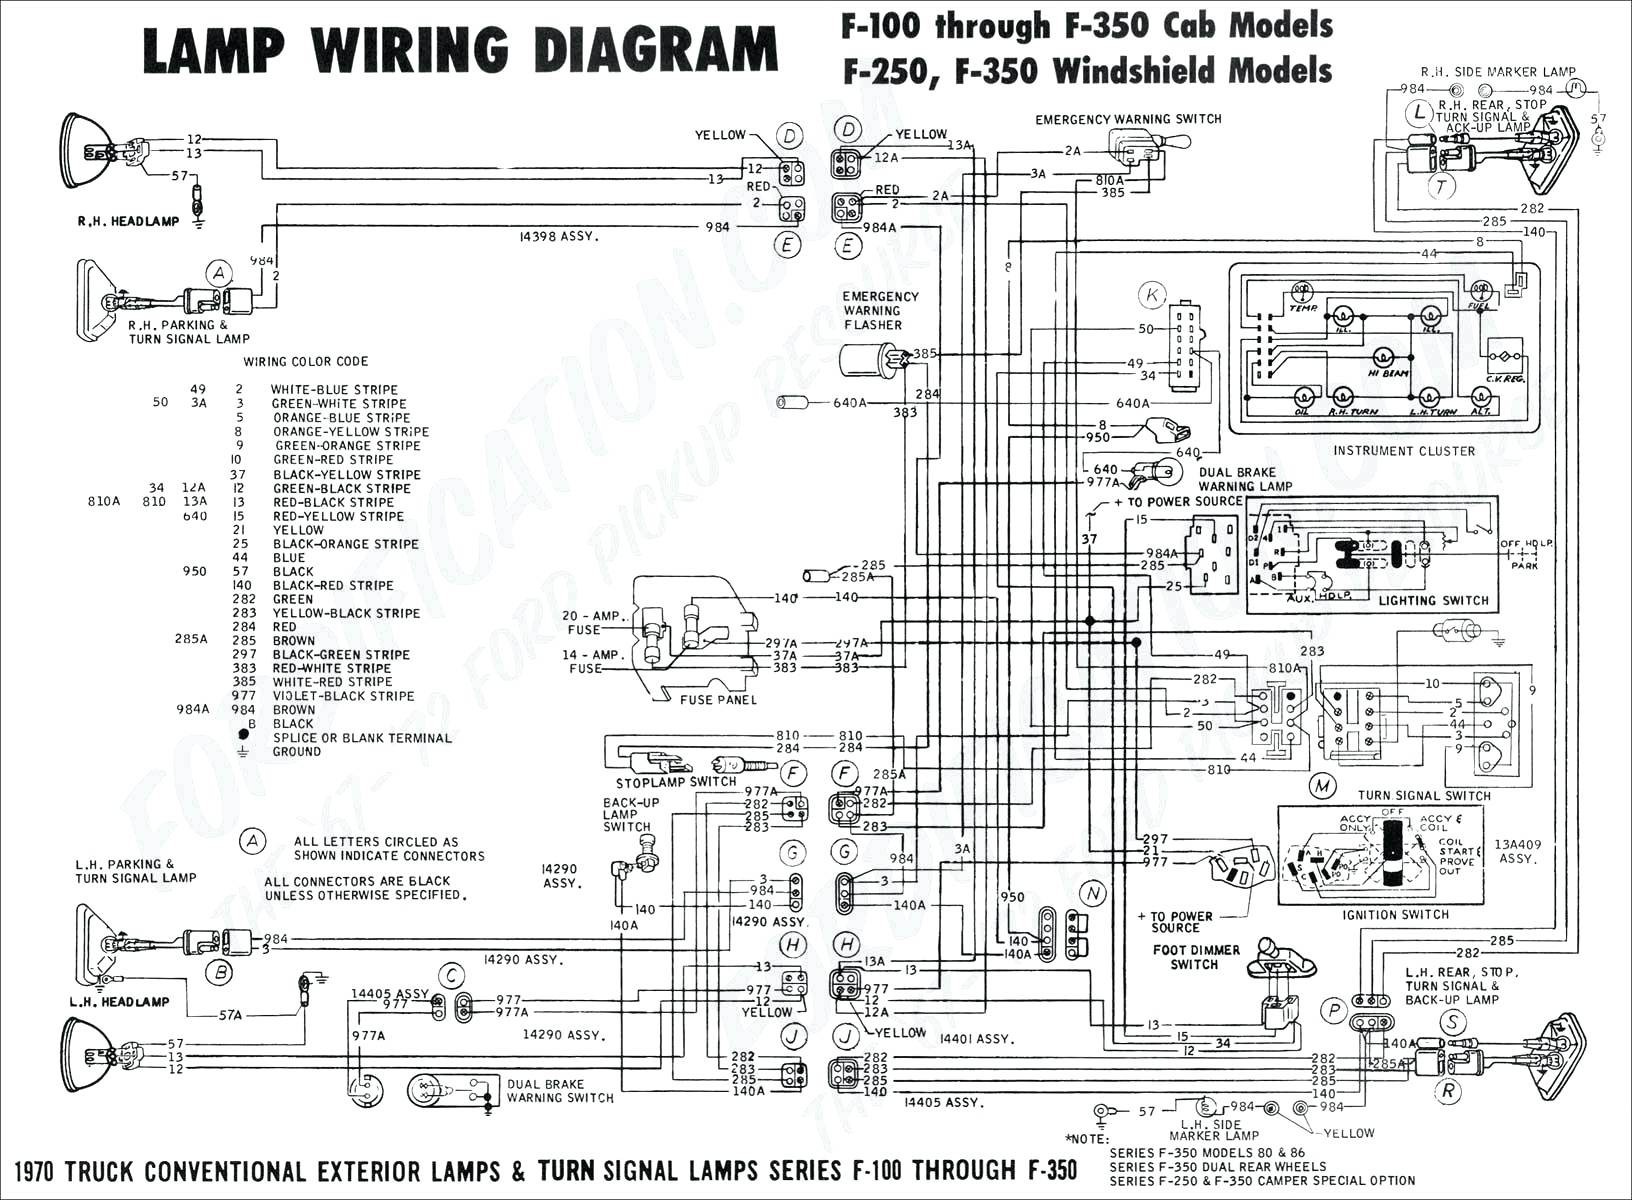 [TVPR_3874]  XK_2631] Bad Boy Buggy Wiring Diagram Also 2004 Gmc Sierra Brake System Diagram  Wiring Diagram | 1997 Gmc Topkick Wiring Diagram |  | Antus Dome Mohammedshrine Librar Wiring 101